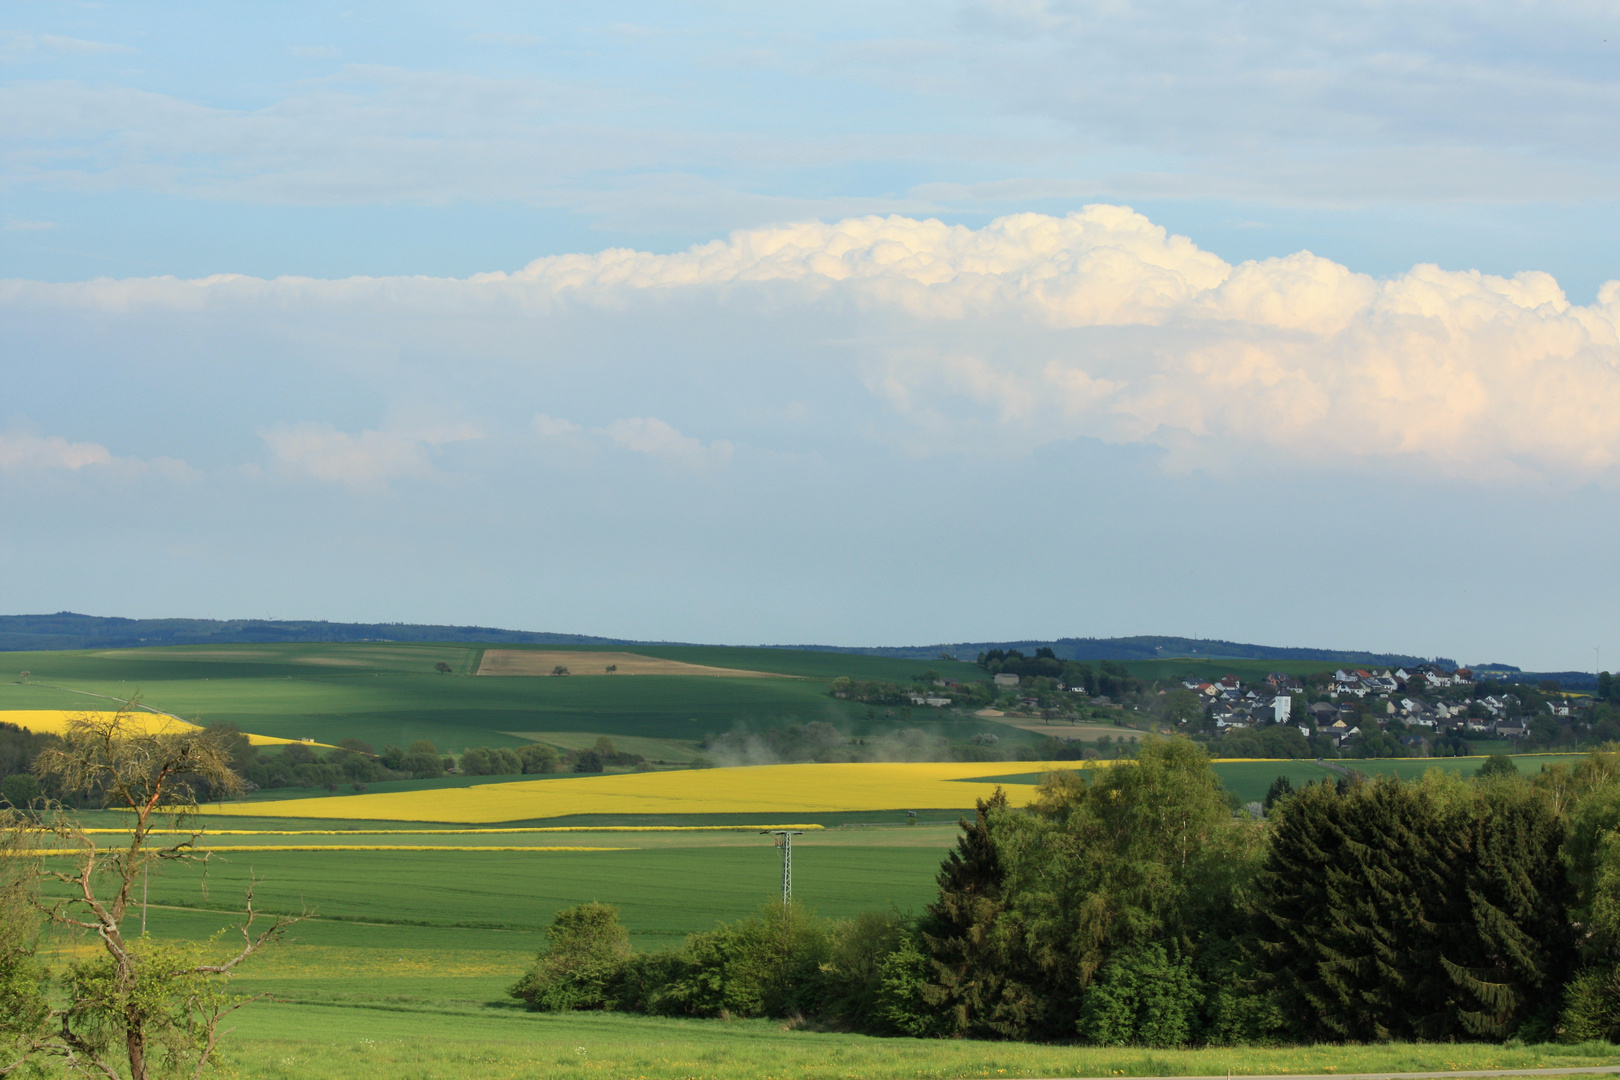 Wetterbericht Himmighofen 23.04.14 Nachmittag